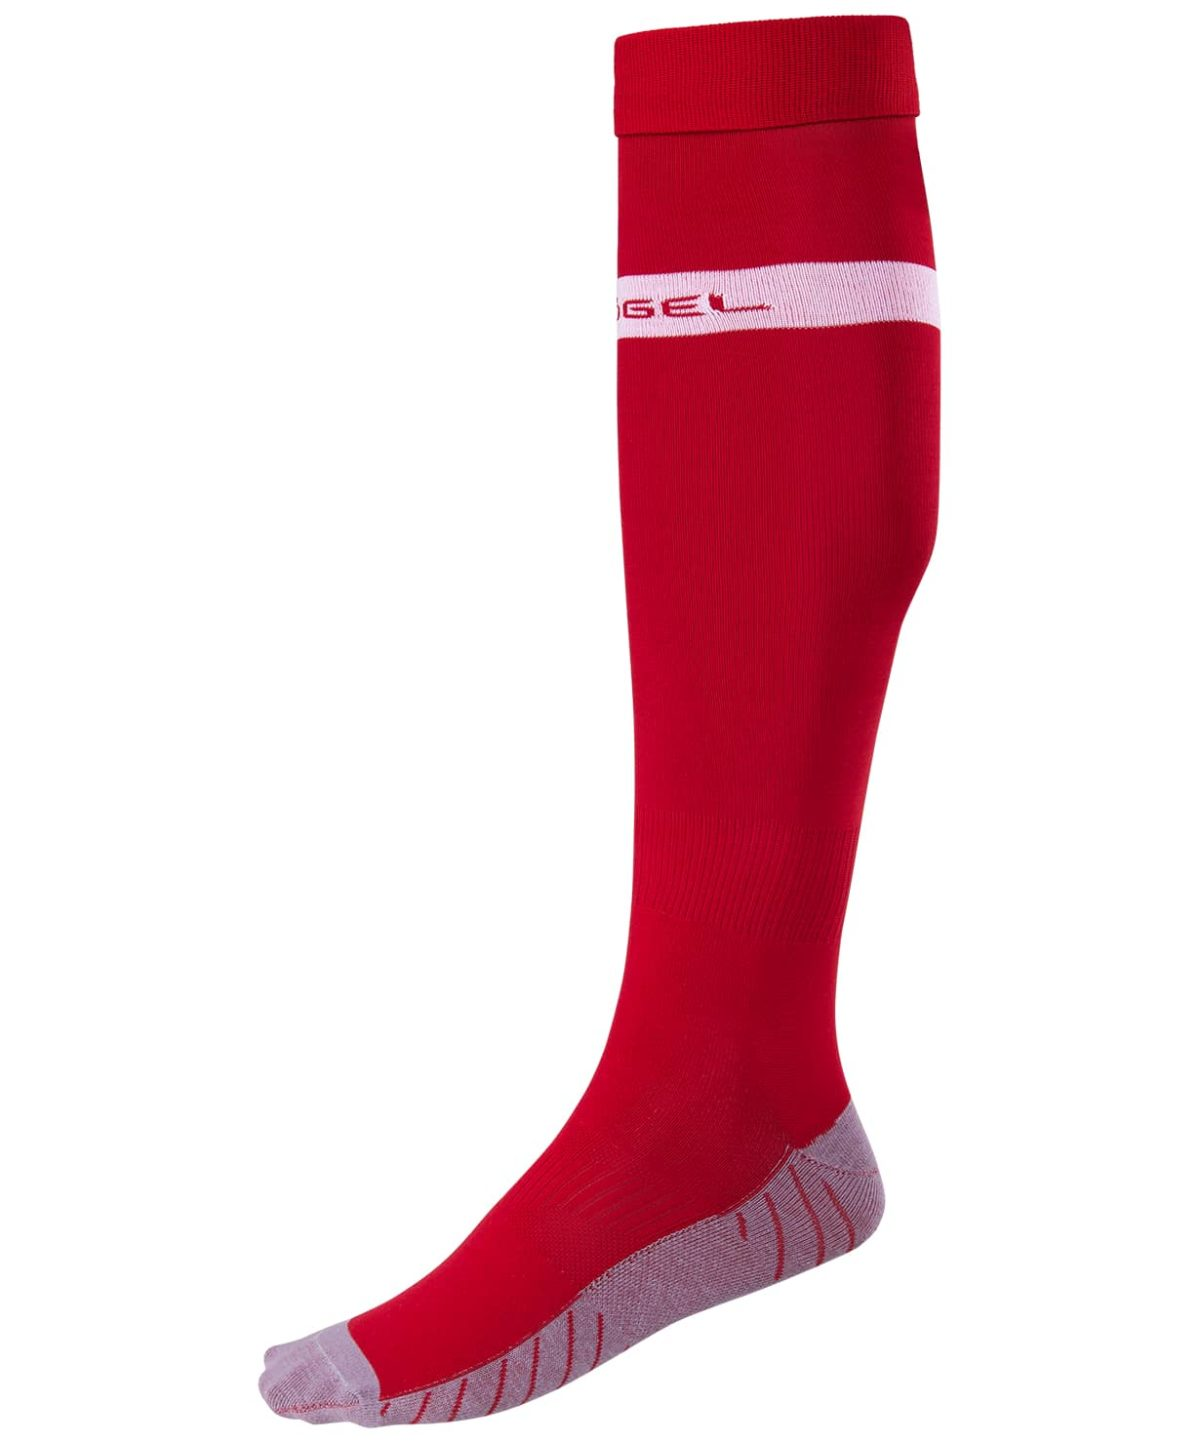 JOGEL Гетры футбольные, красный/белый  JA-003 - 1